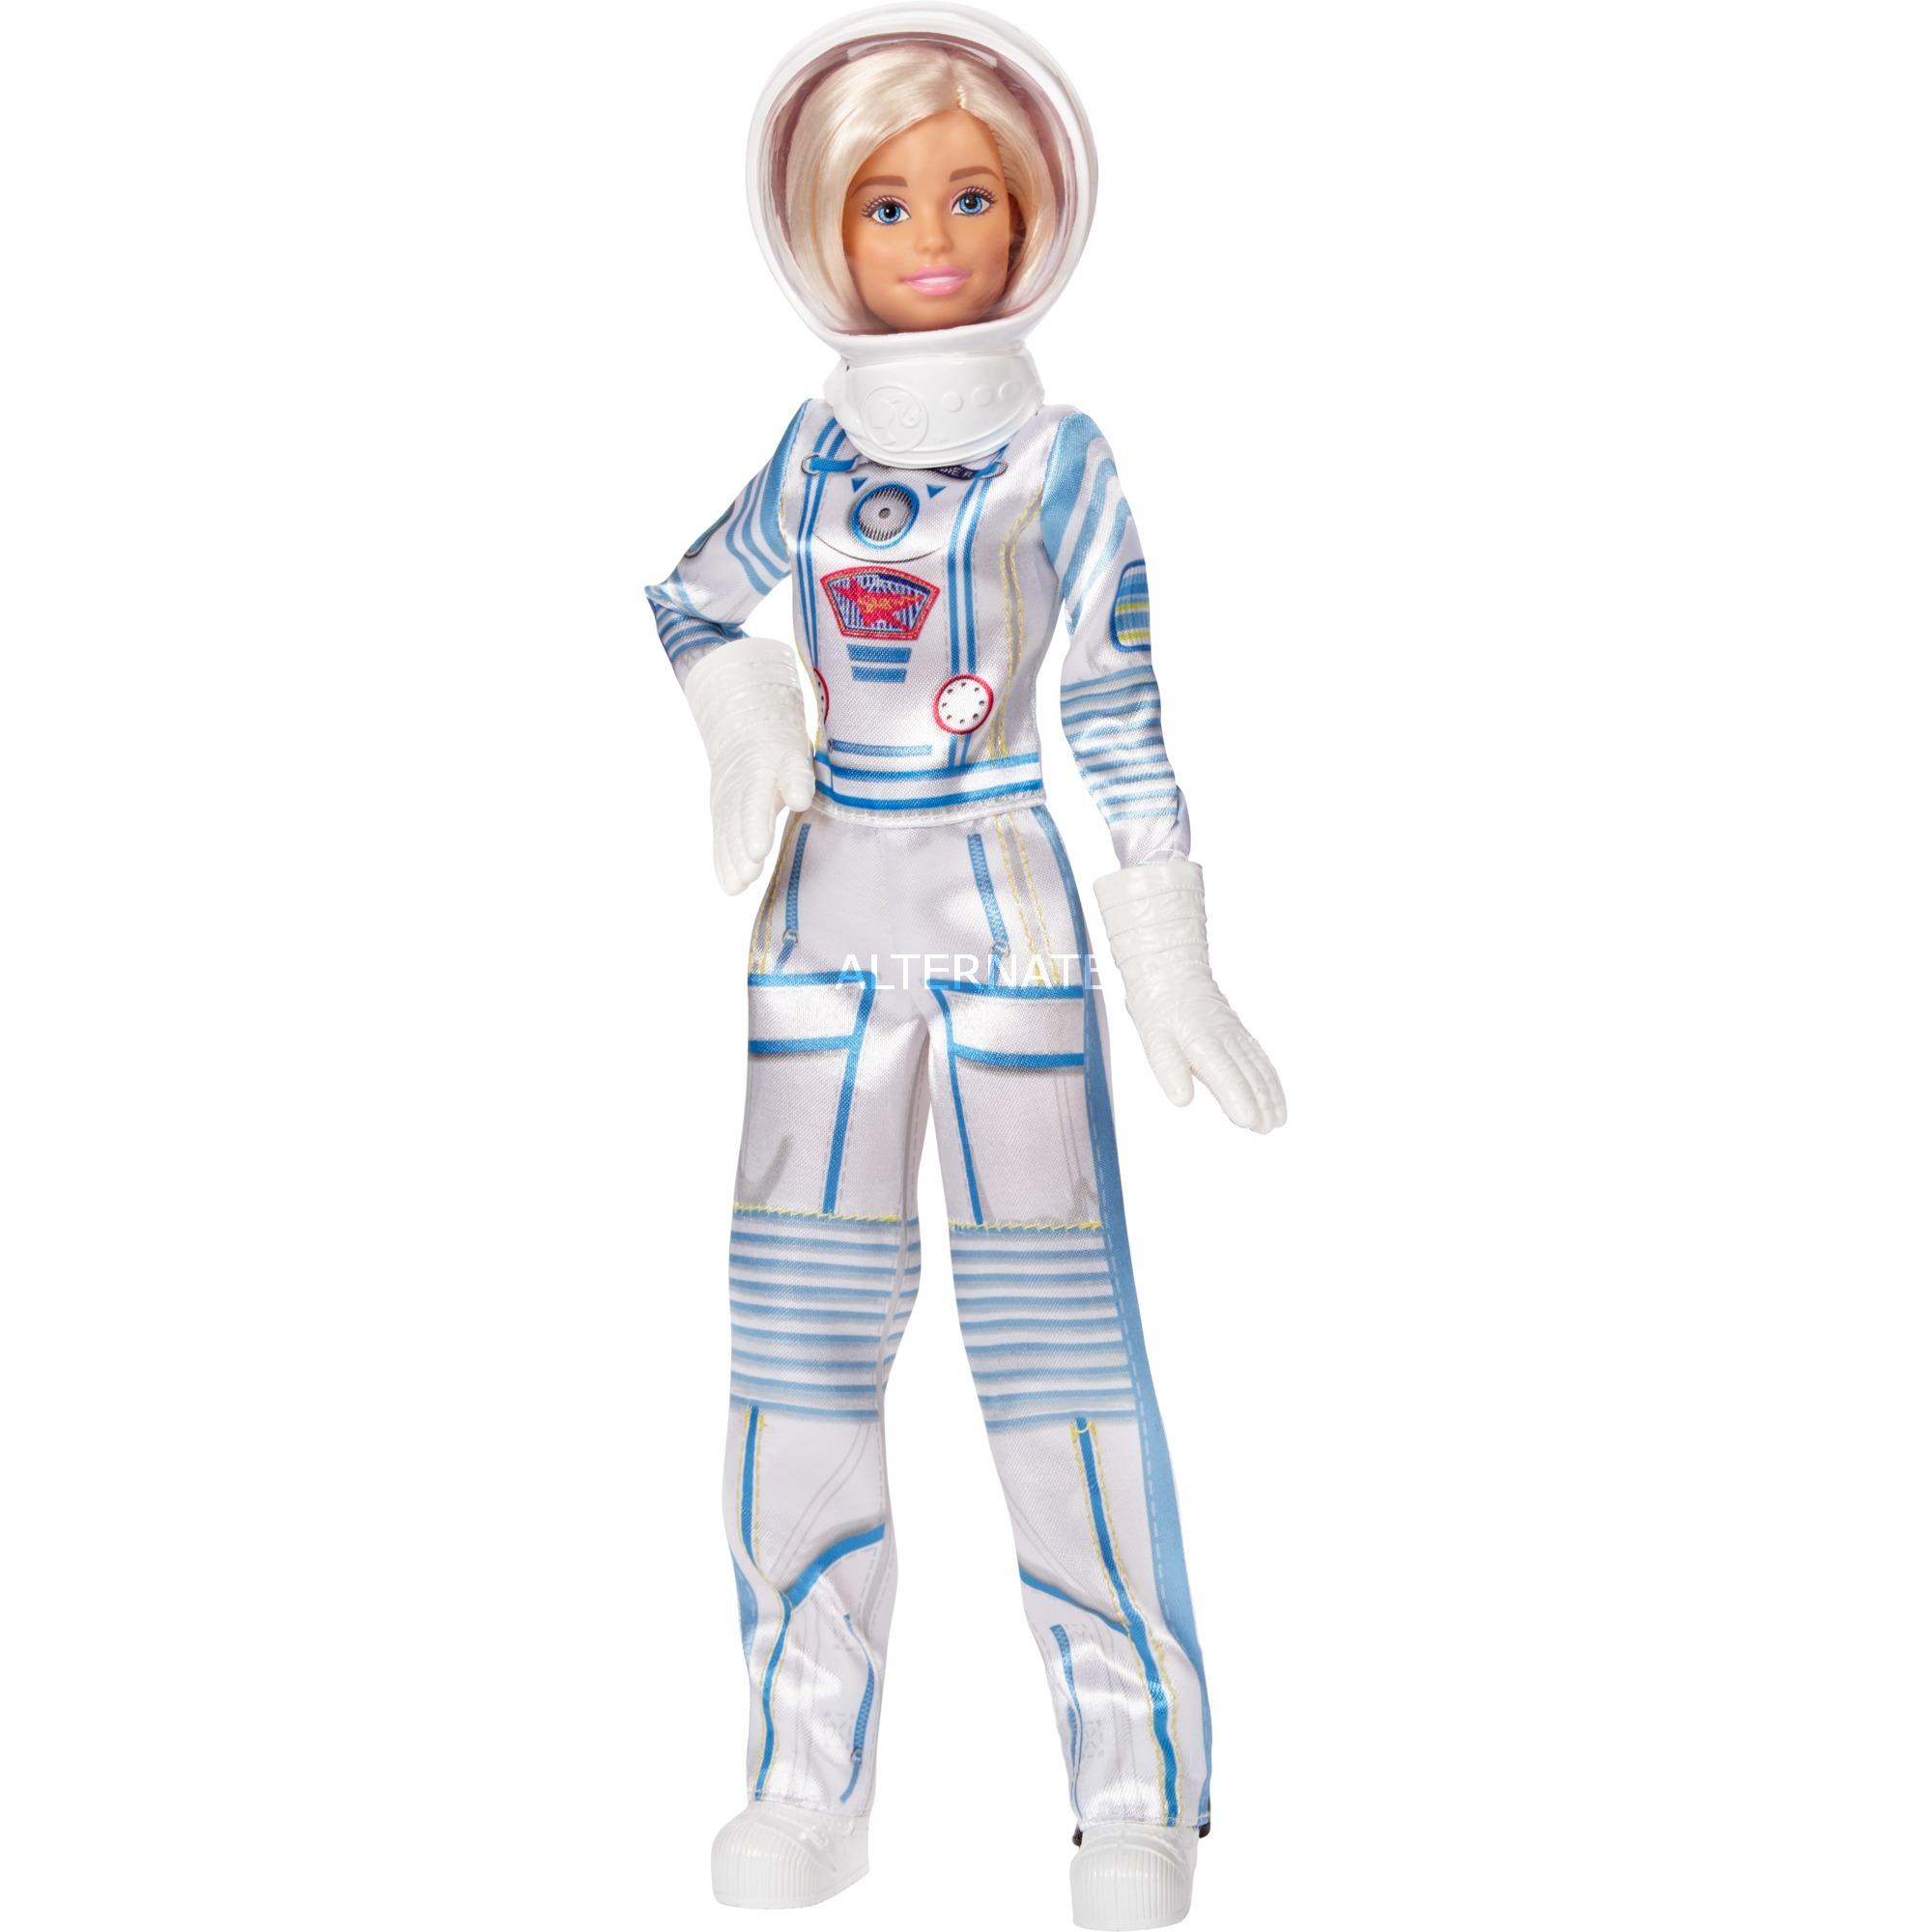 Astronaut Doll, Muñecos